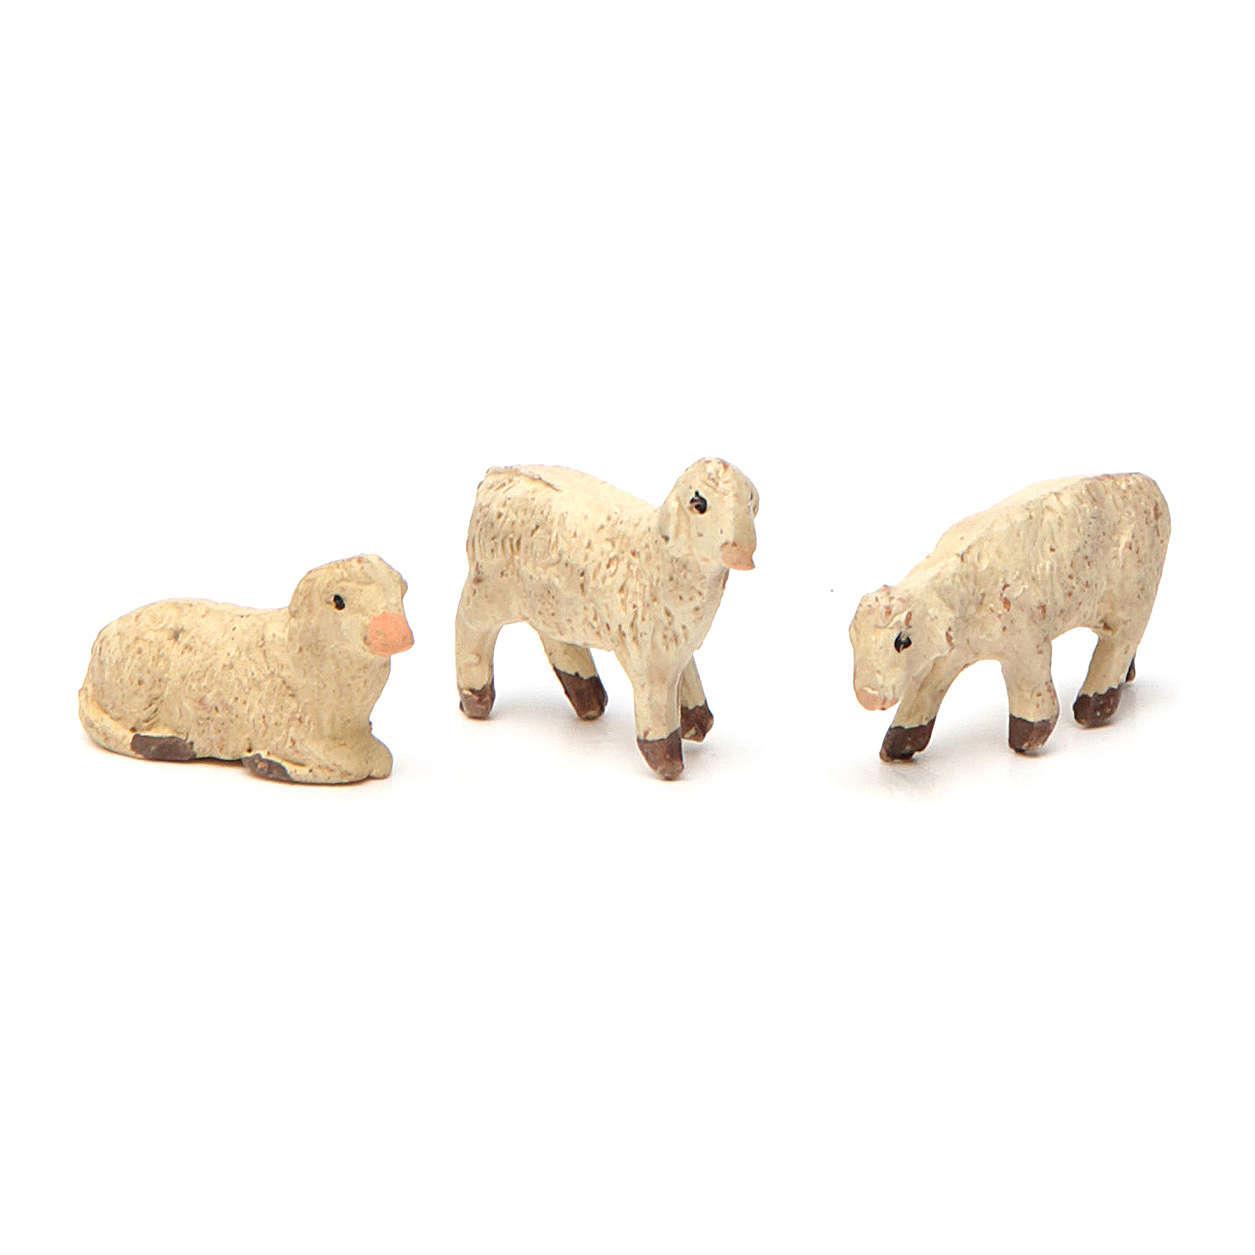 Terracotta sheep for Neapolitan Nativity Scene 4 cm 3 pieces 4